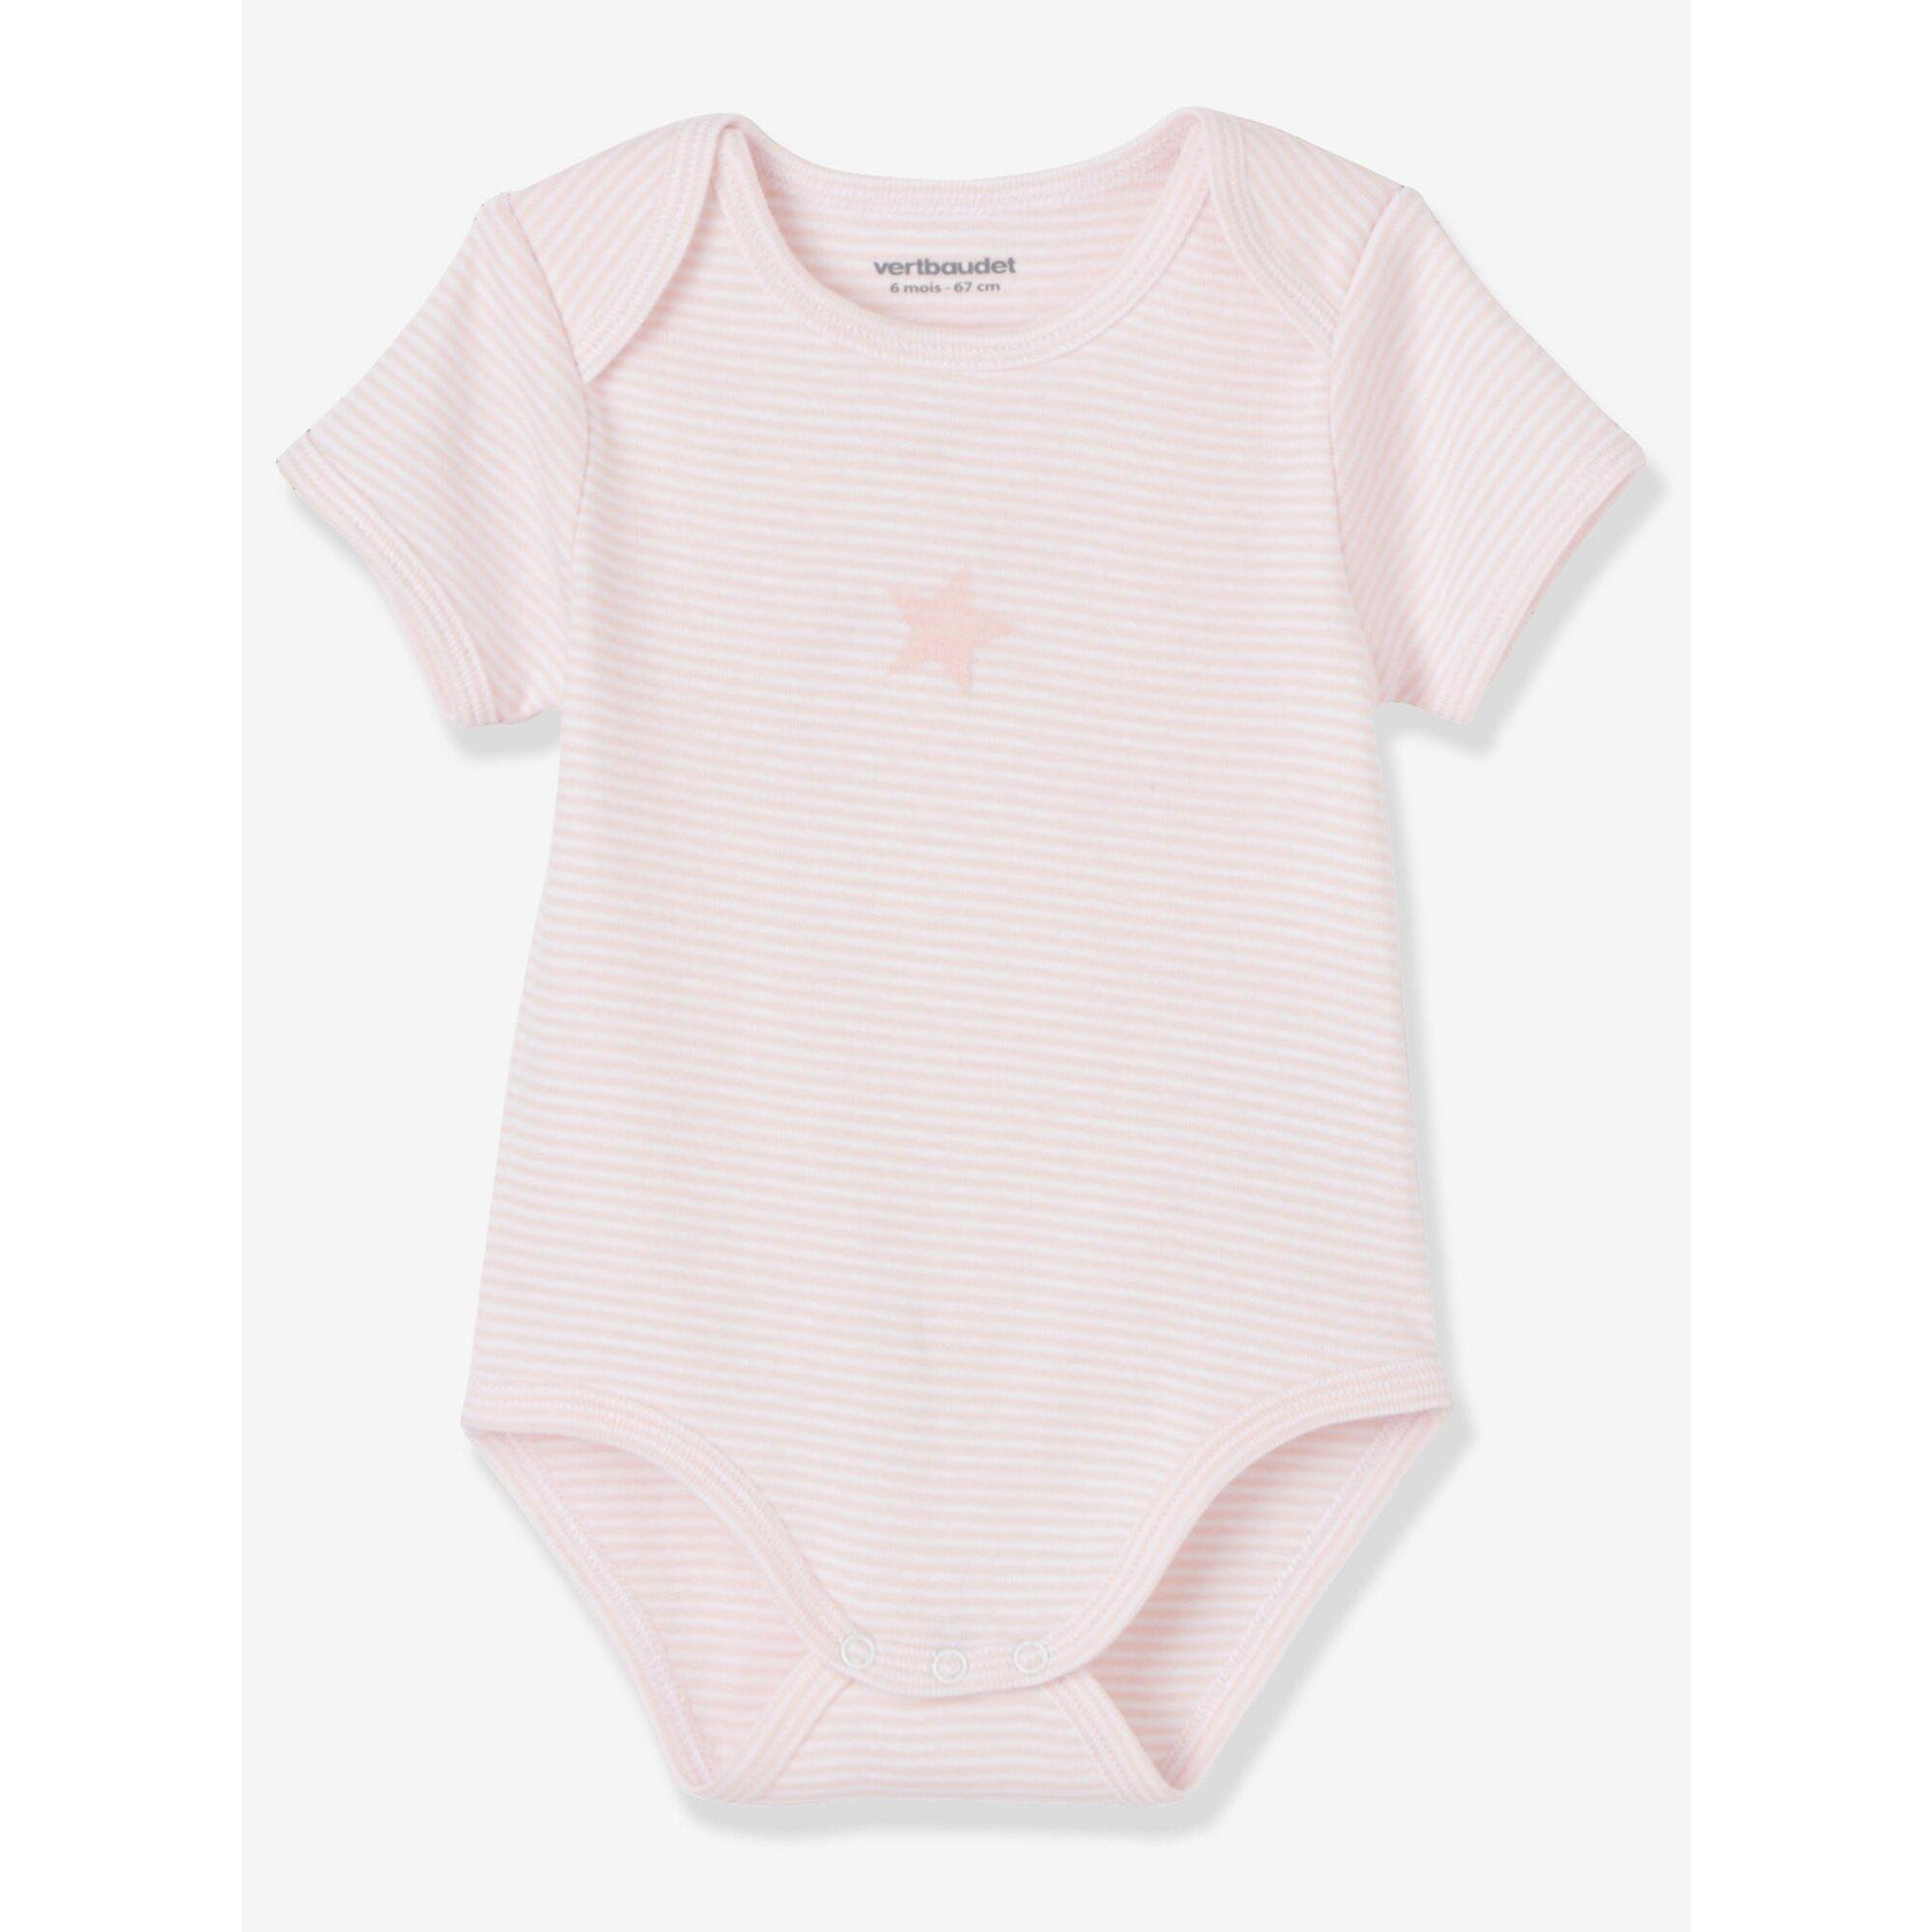 vertbaudet-3er-pack-bodys-fur-babys-kurze-armel, 15.99 EUR @ babywalz-de